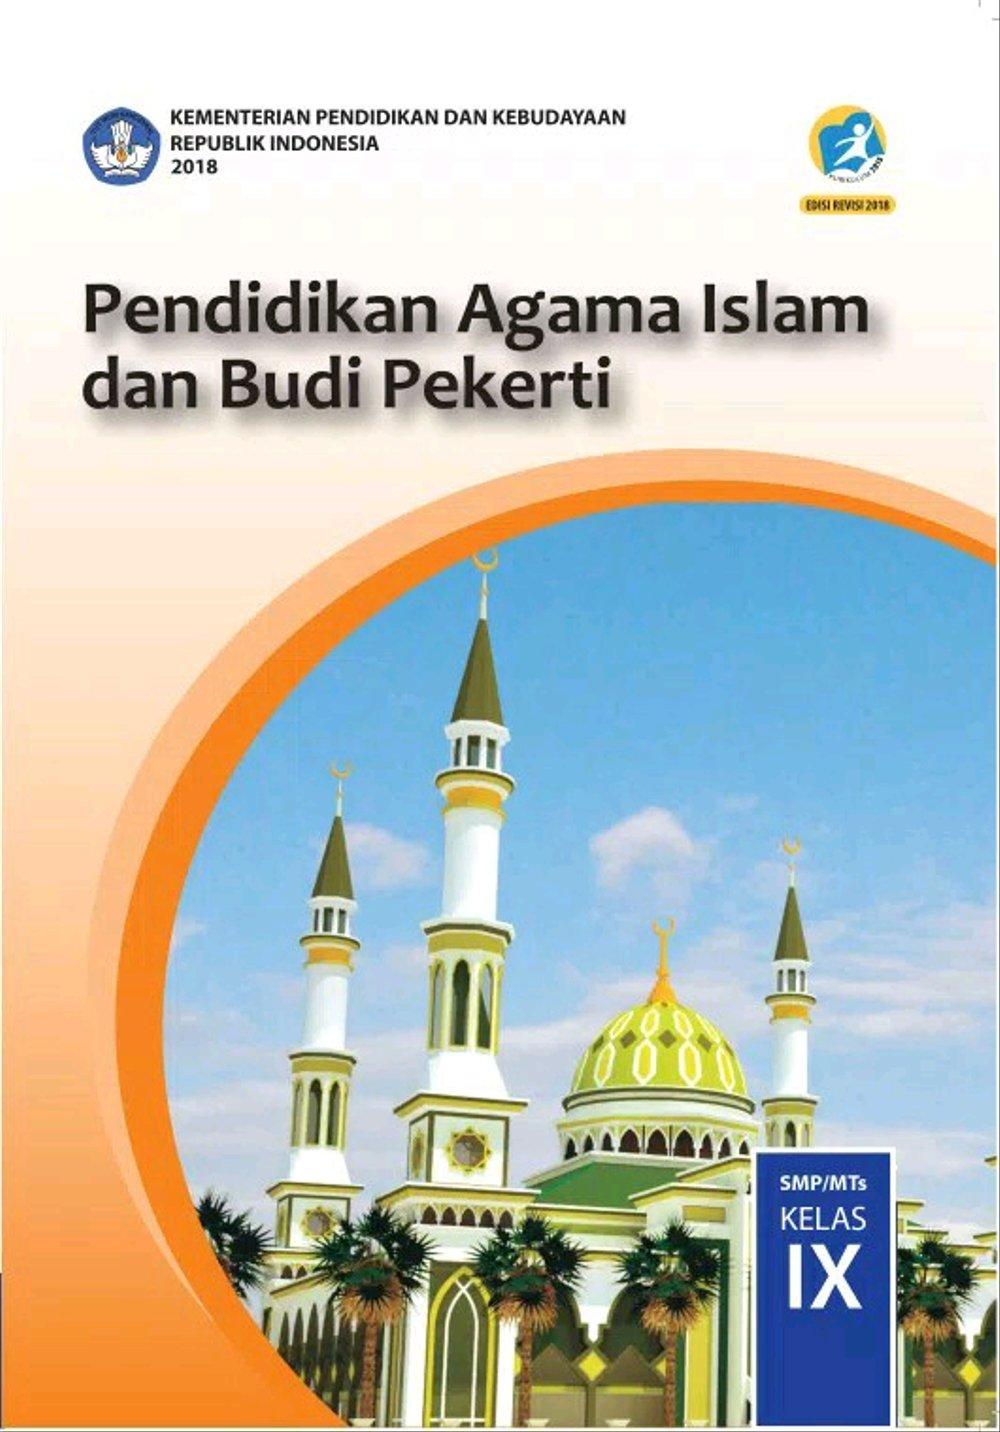 Soal Dan Jawaban Pilihan Ganda Pendidikan Agama Islam Smp Kelas 9 Halaman 256 S D 257